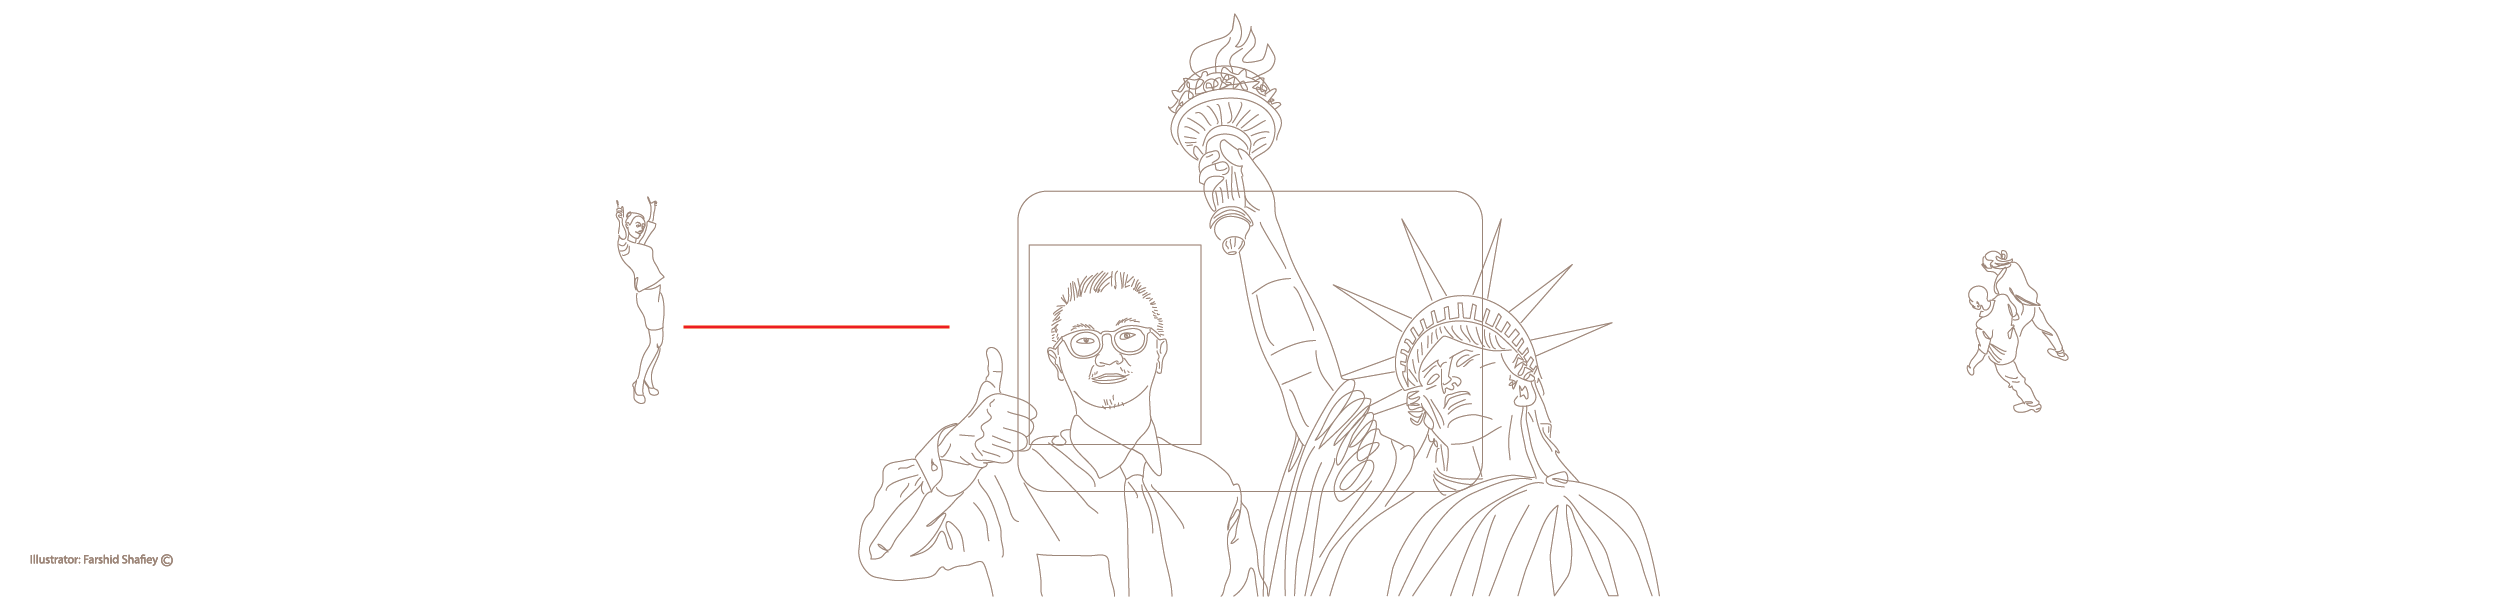 Deportation Defense